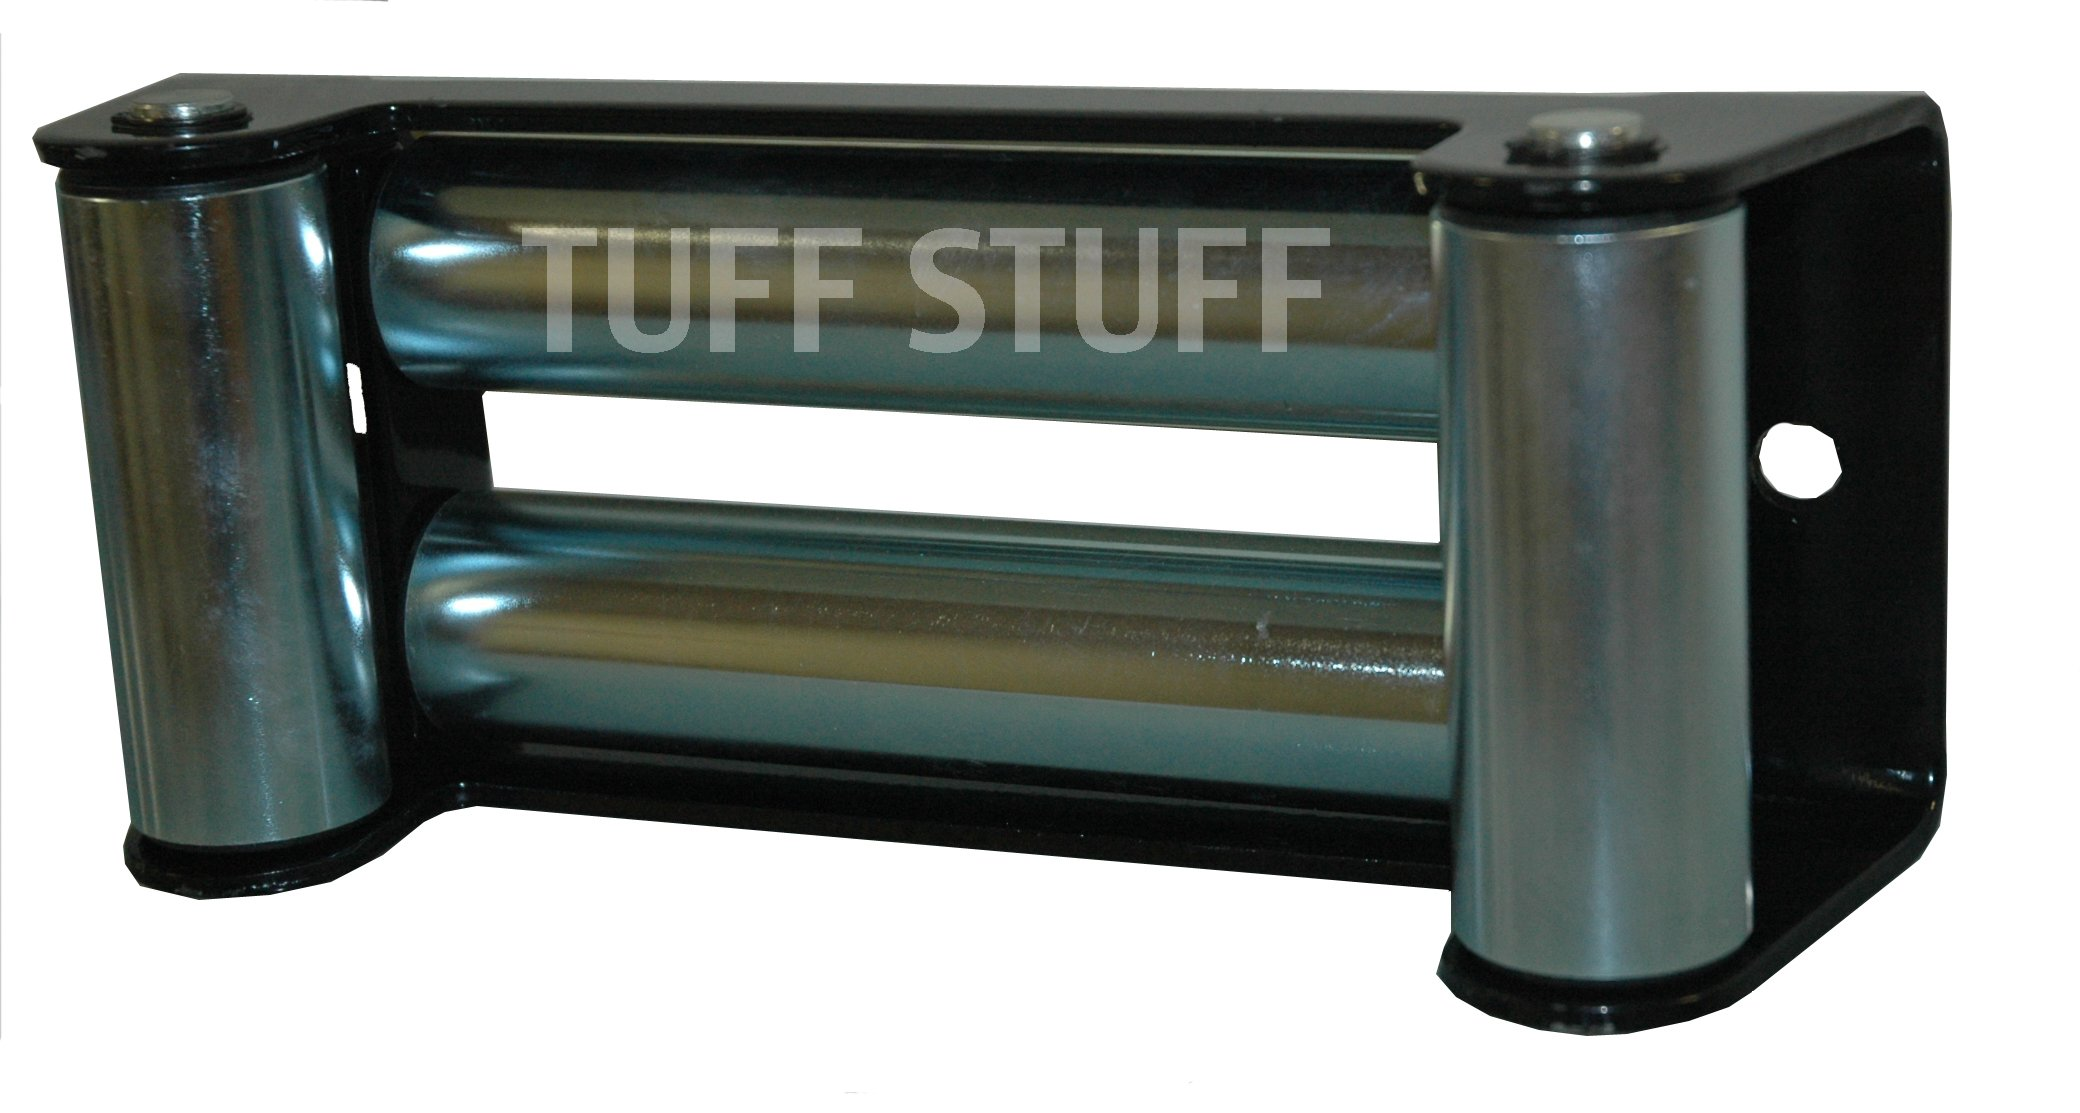 Tuff Stuff 4 Way Roller Fairlead Winch Cable, 10'' Bolt Pattern by Tuff Stuff